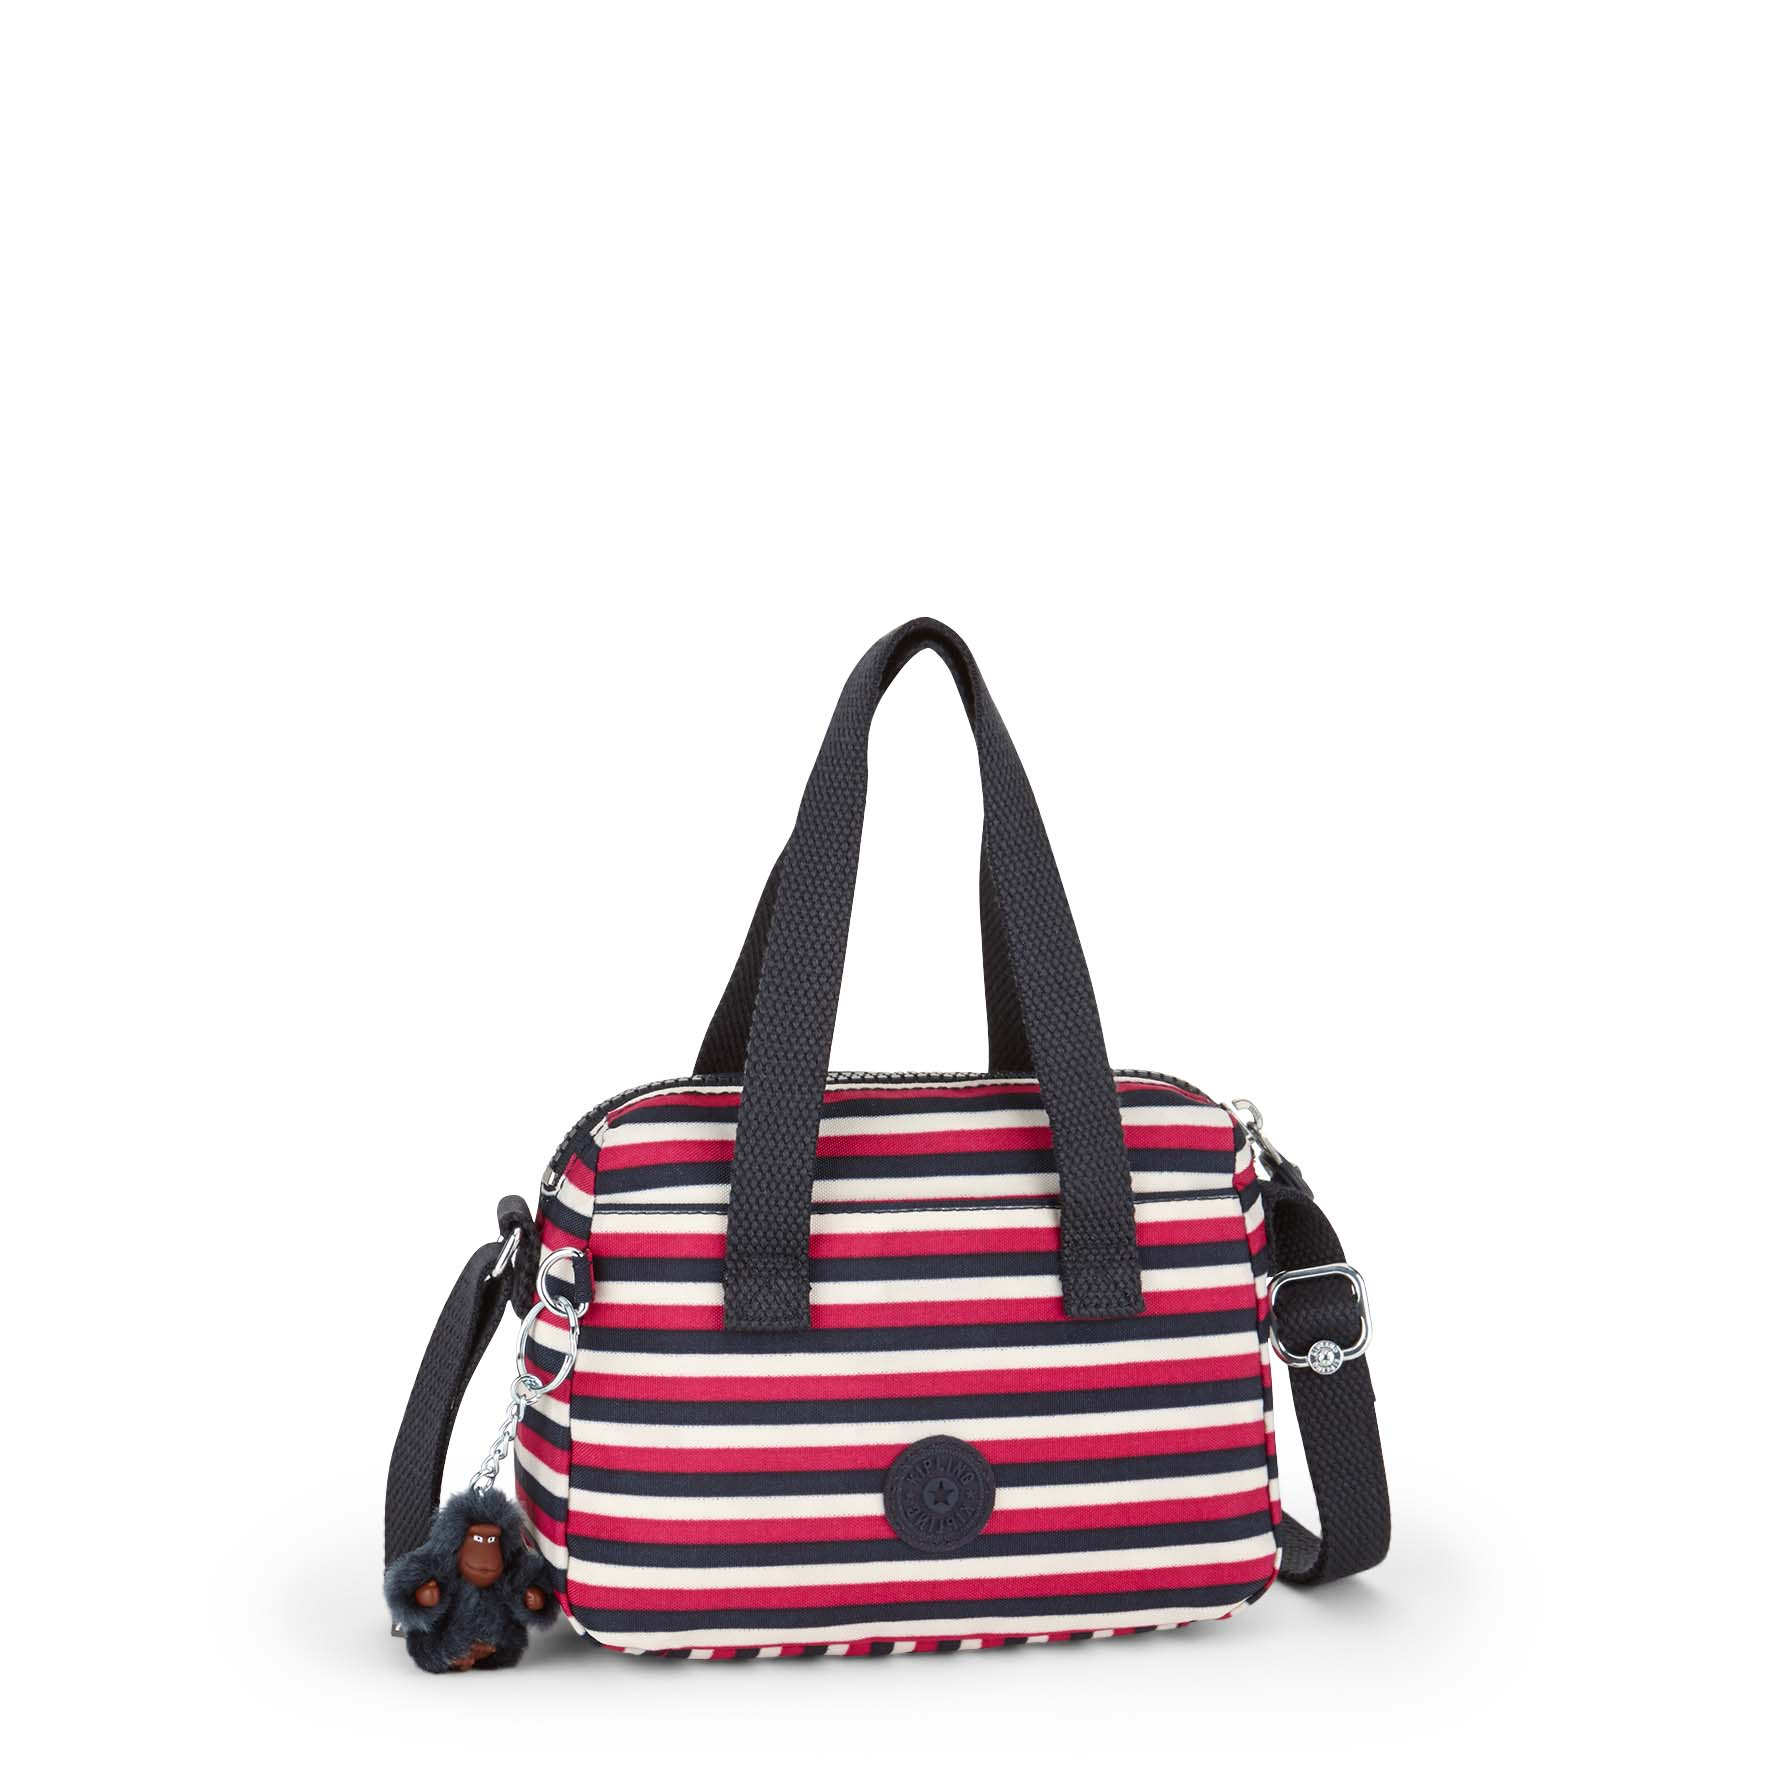 40b6aadb87b  Magrudy.com - Bags & Luggage